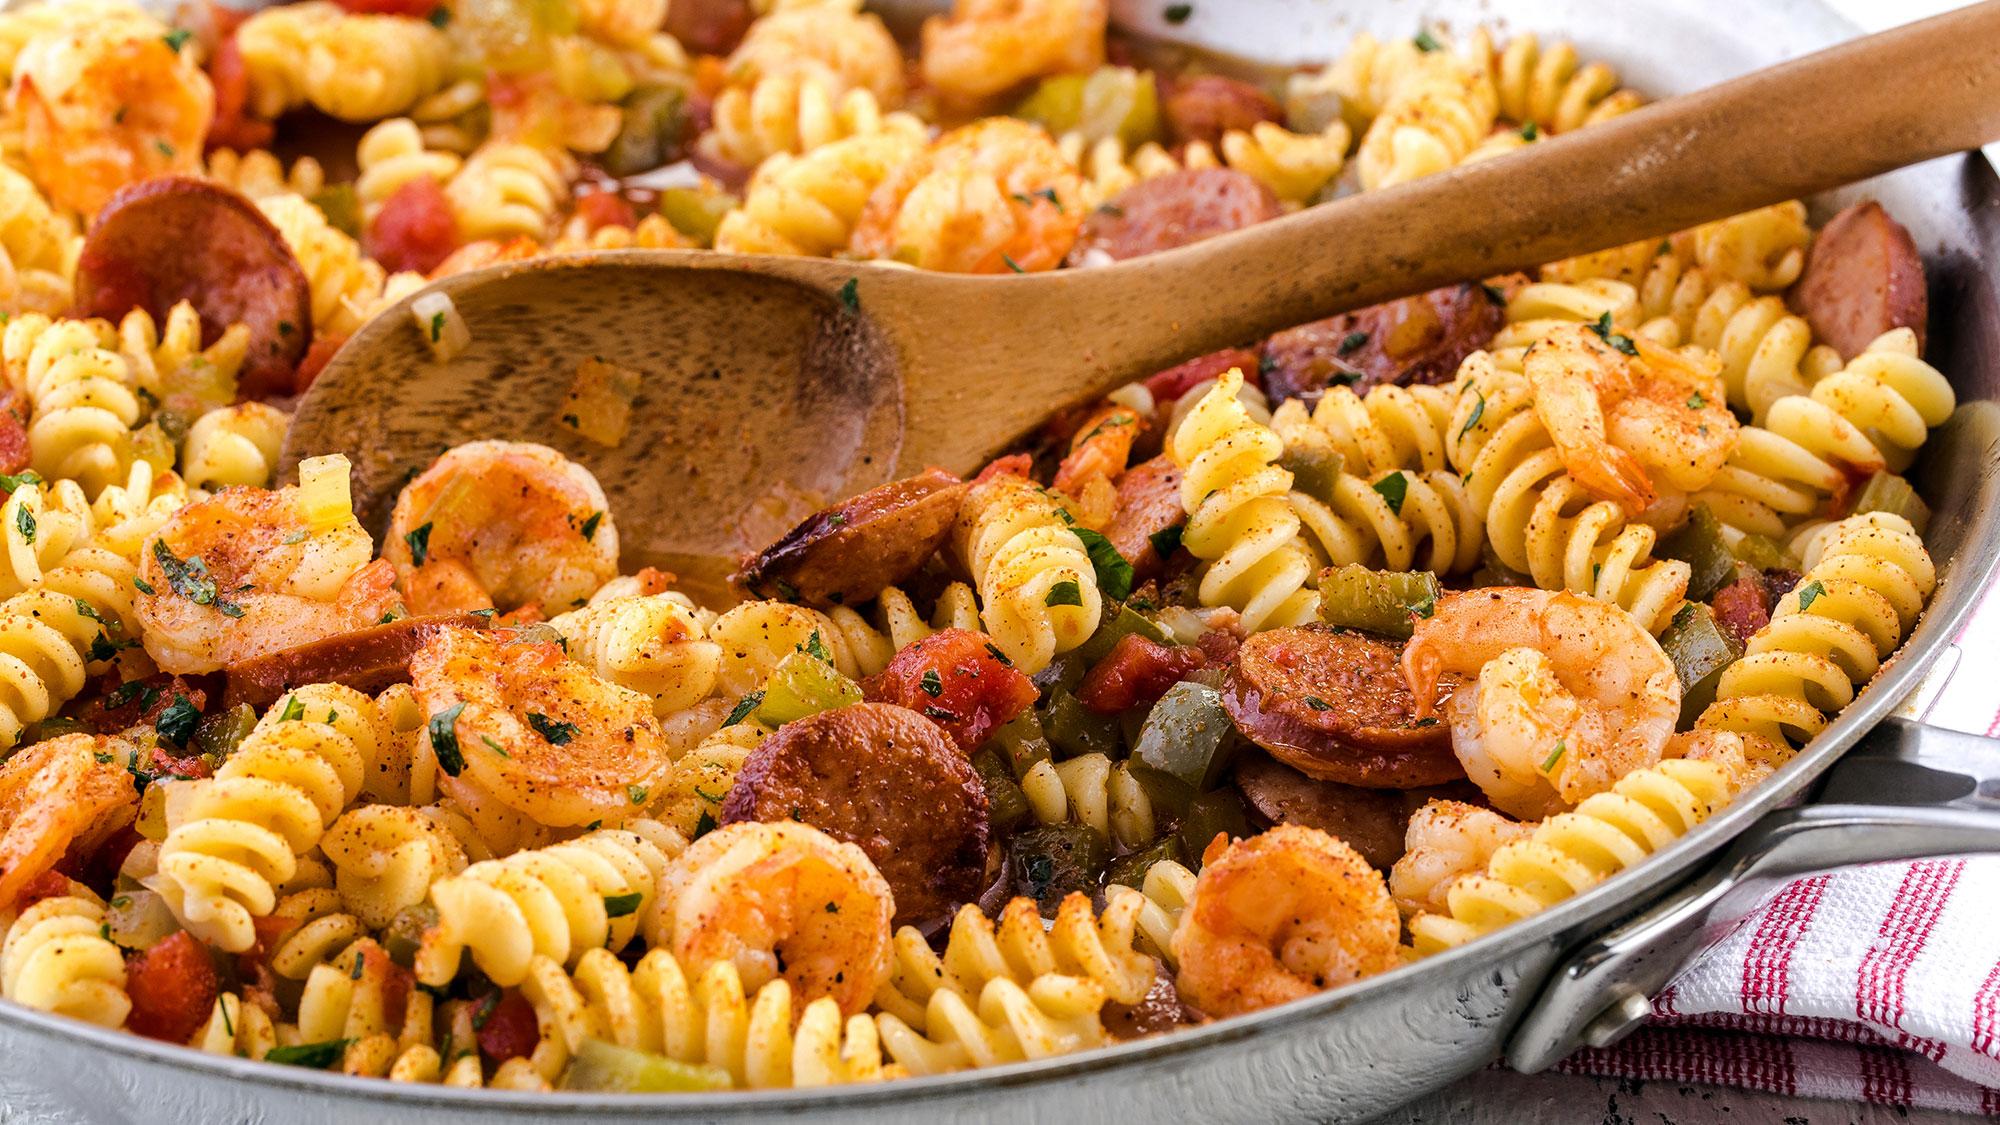 Shrimp-and-Sausage-Pastalaya-2000x1125.jpg